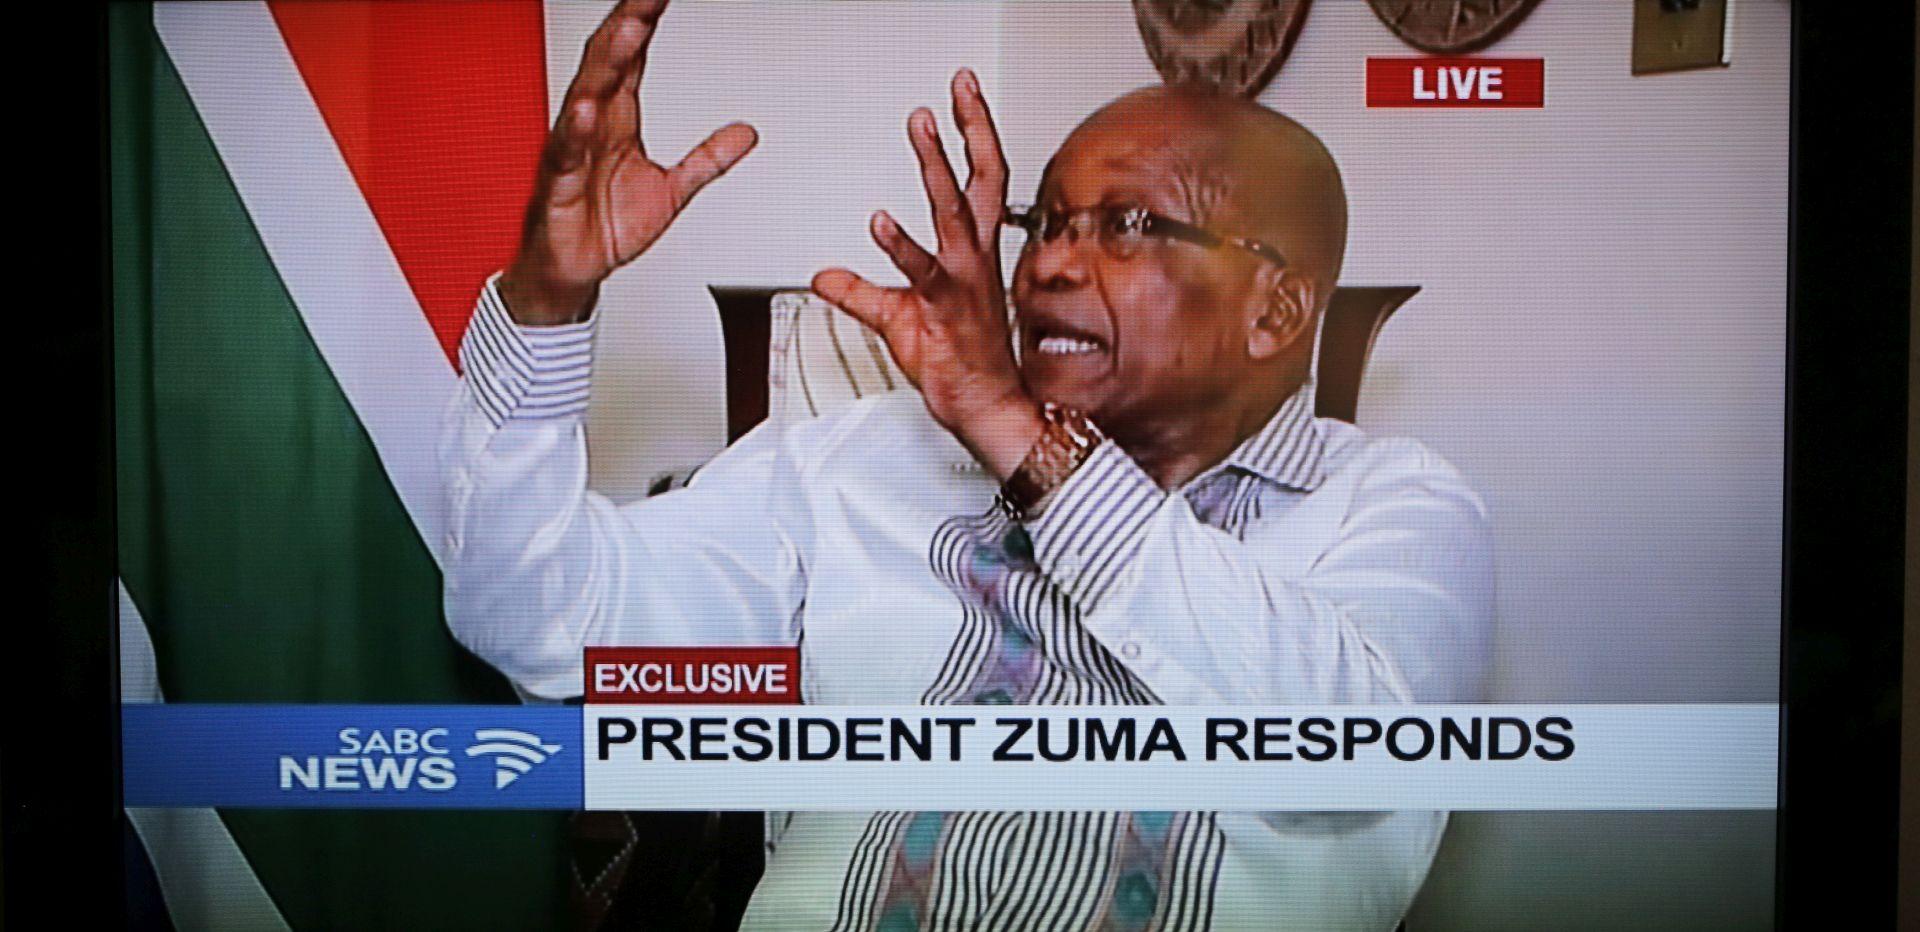 Jacob Zuma nakon pritiska ipak podnio ostavku